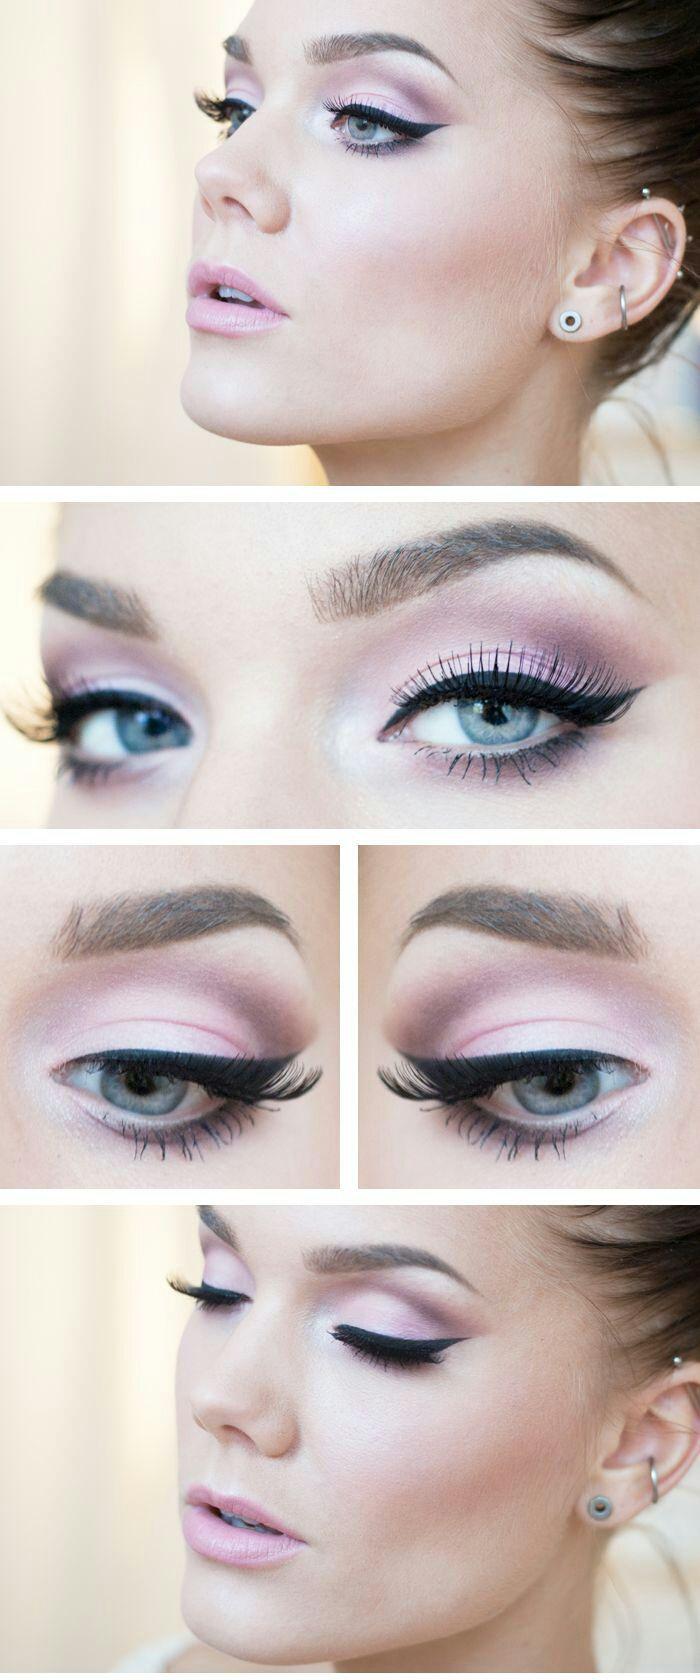 Bridal makeup inspiration - pink eyeshadow - black winged eyeliner & pale pink lip..... See more on my makeup blog!